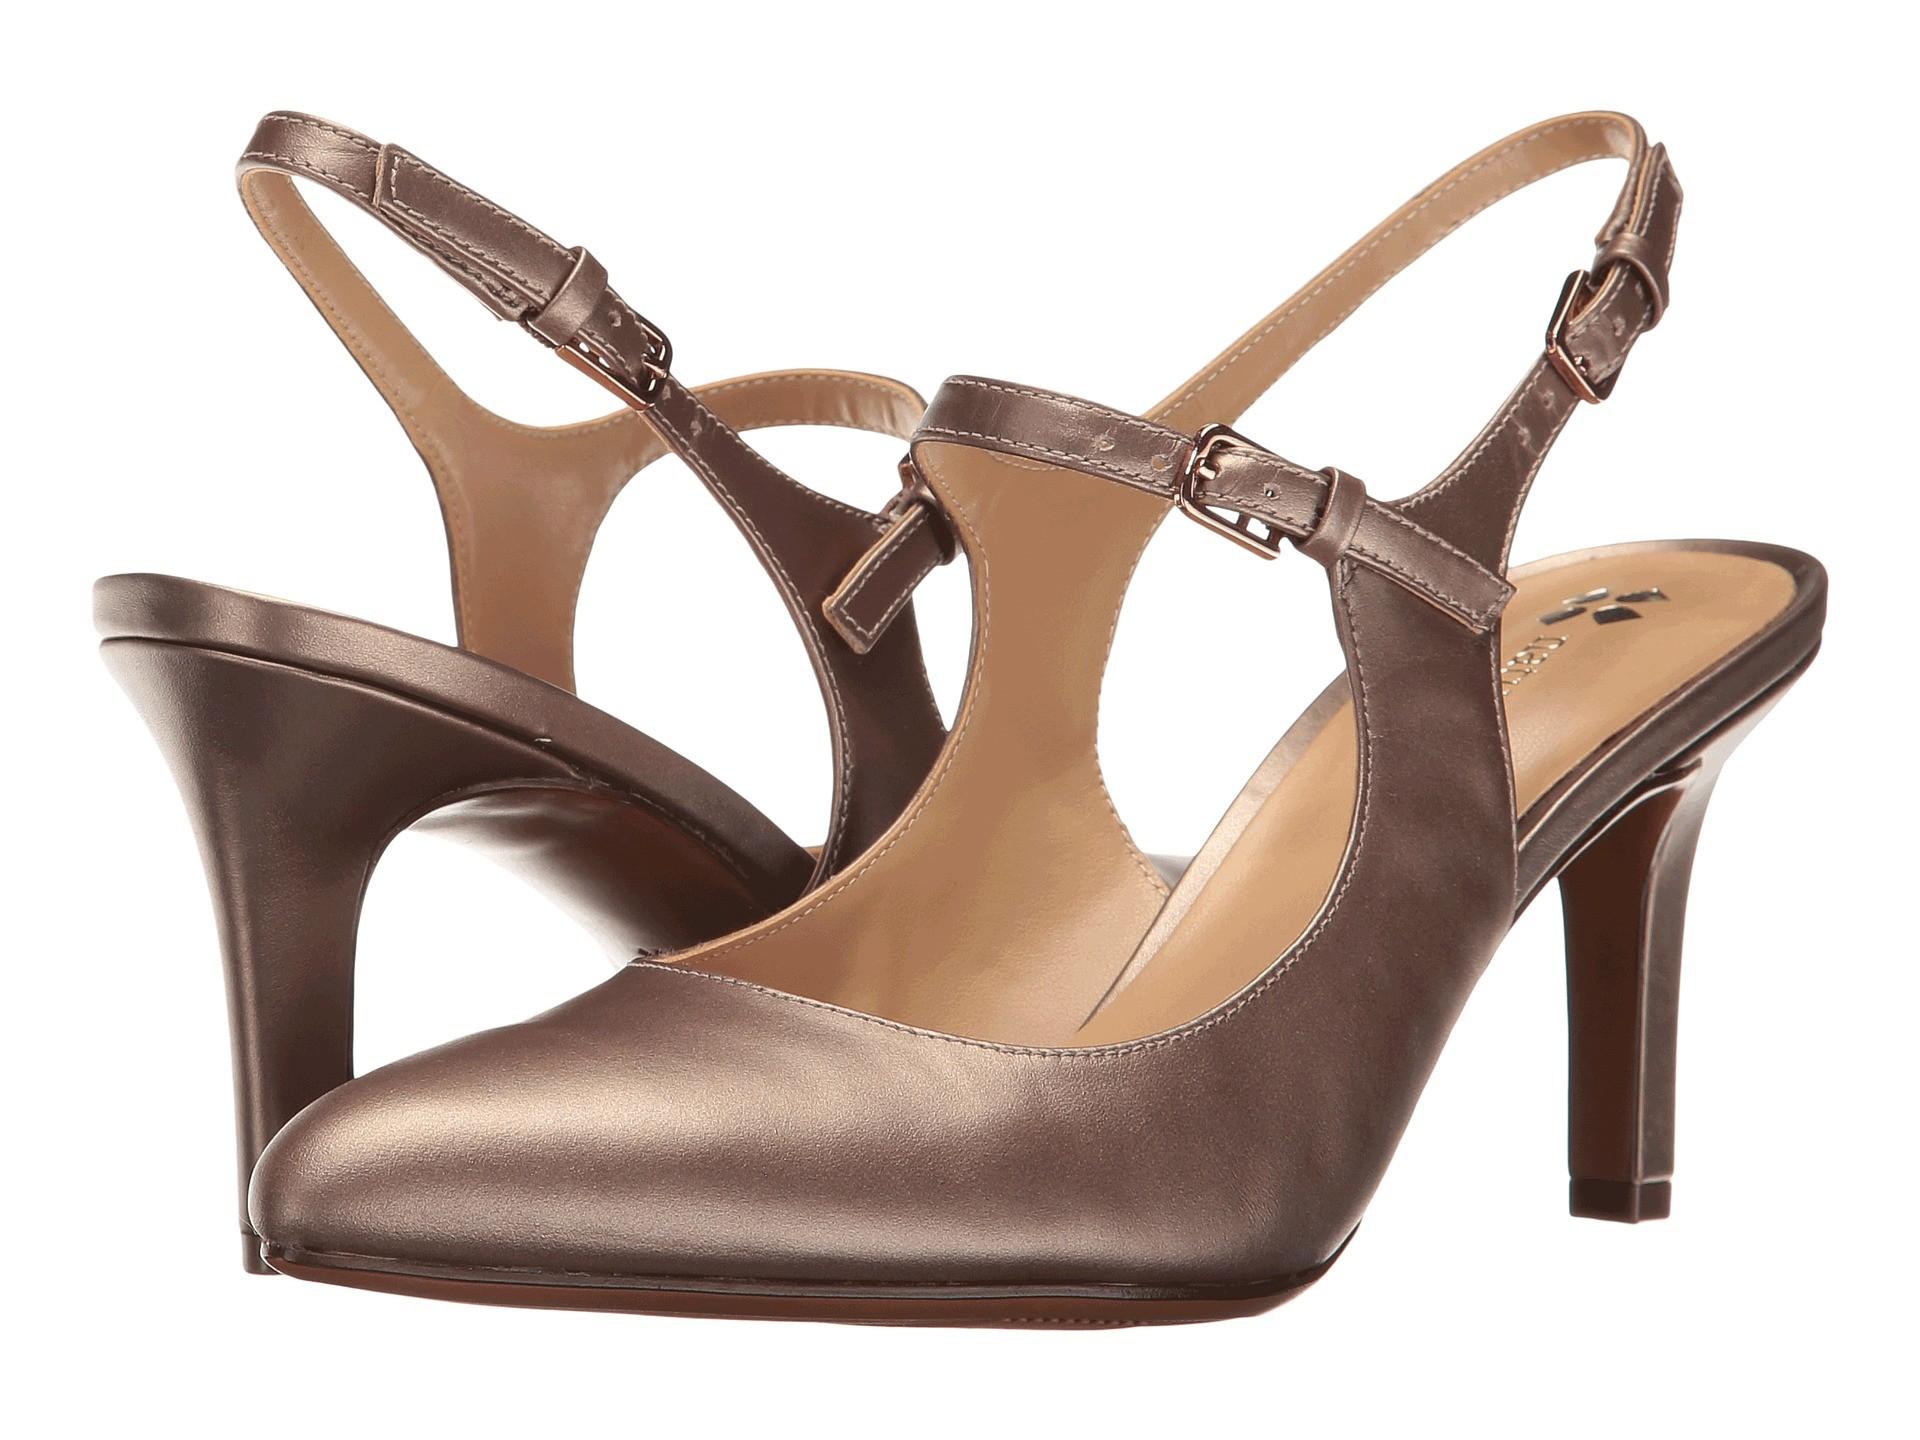 Women's sandals that hide bunions - Zappos